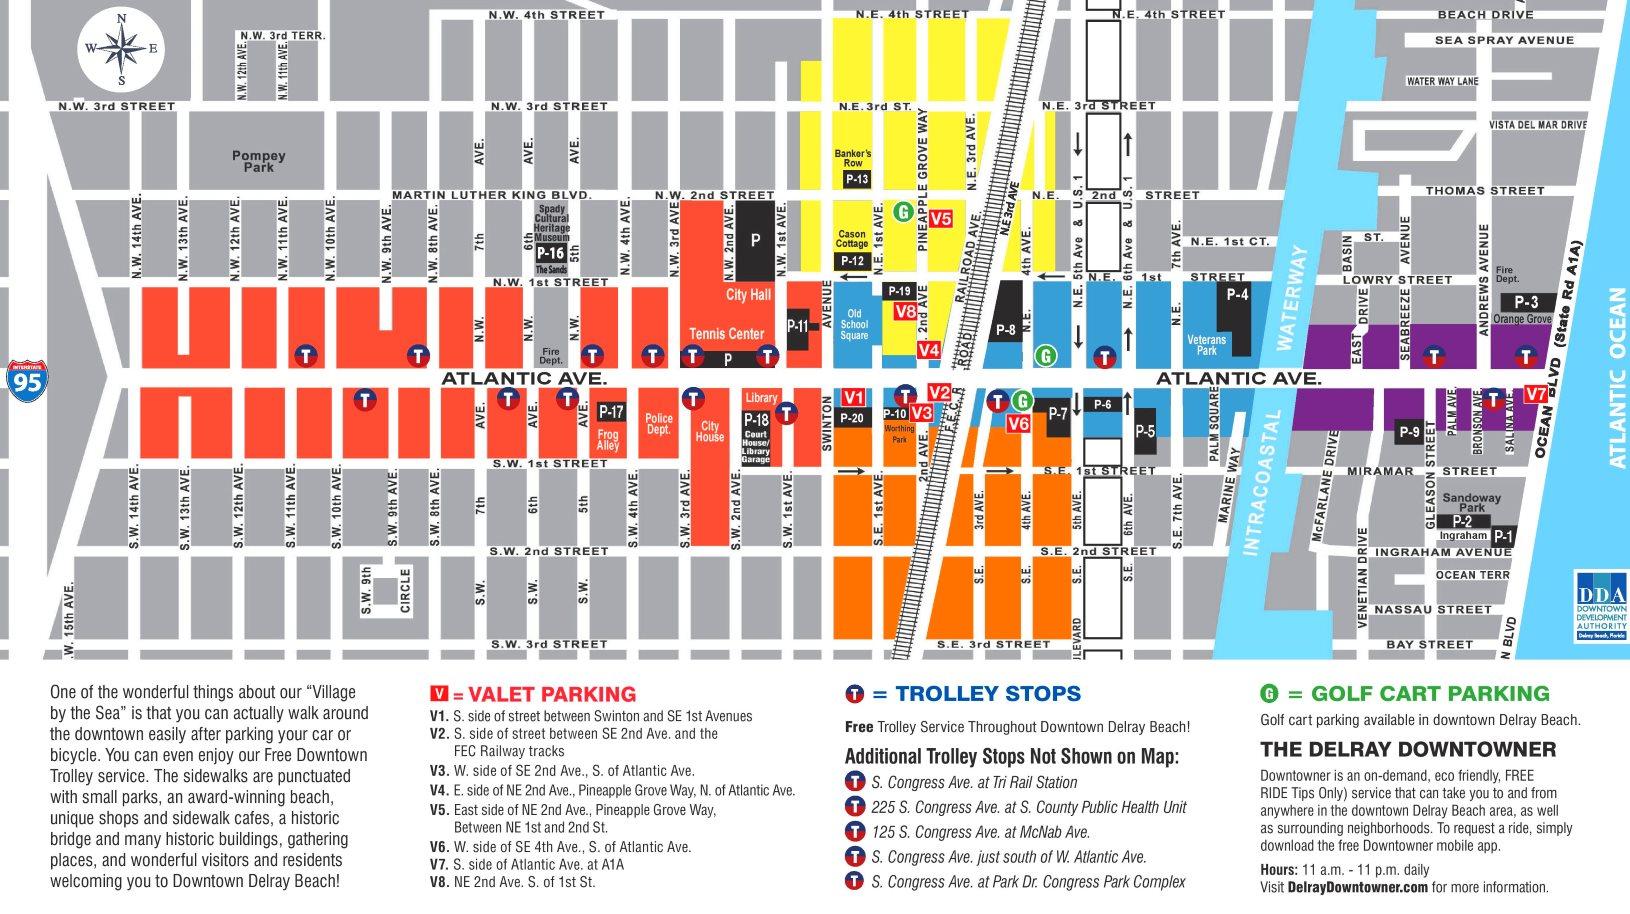 Map Of Florida Delray Beach.Delray Beach Downtown Map